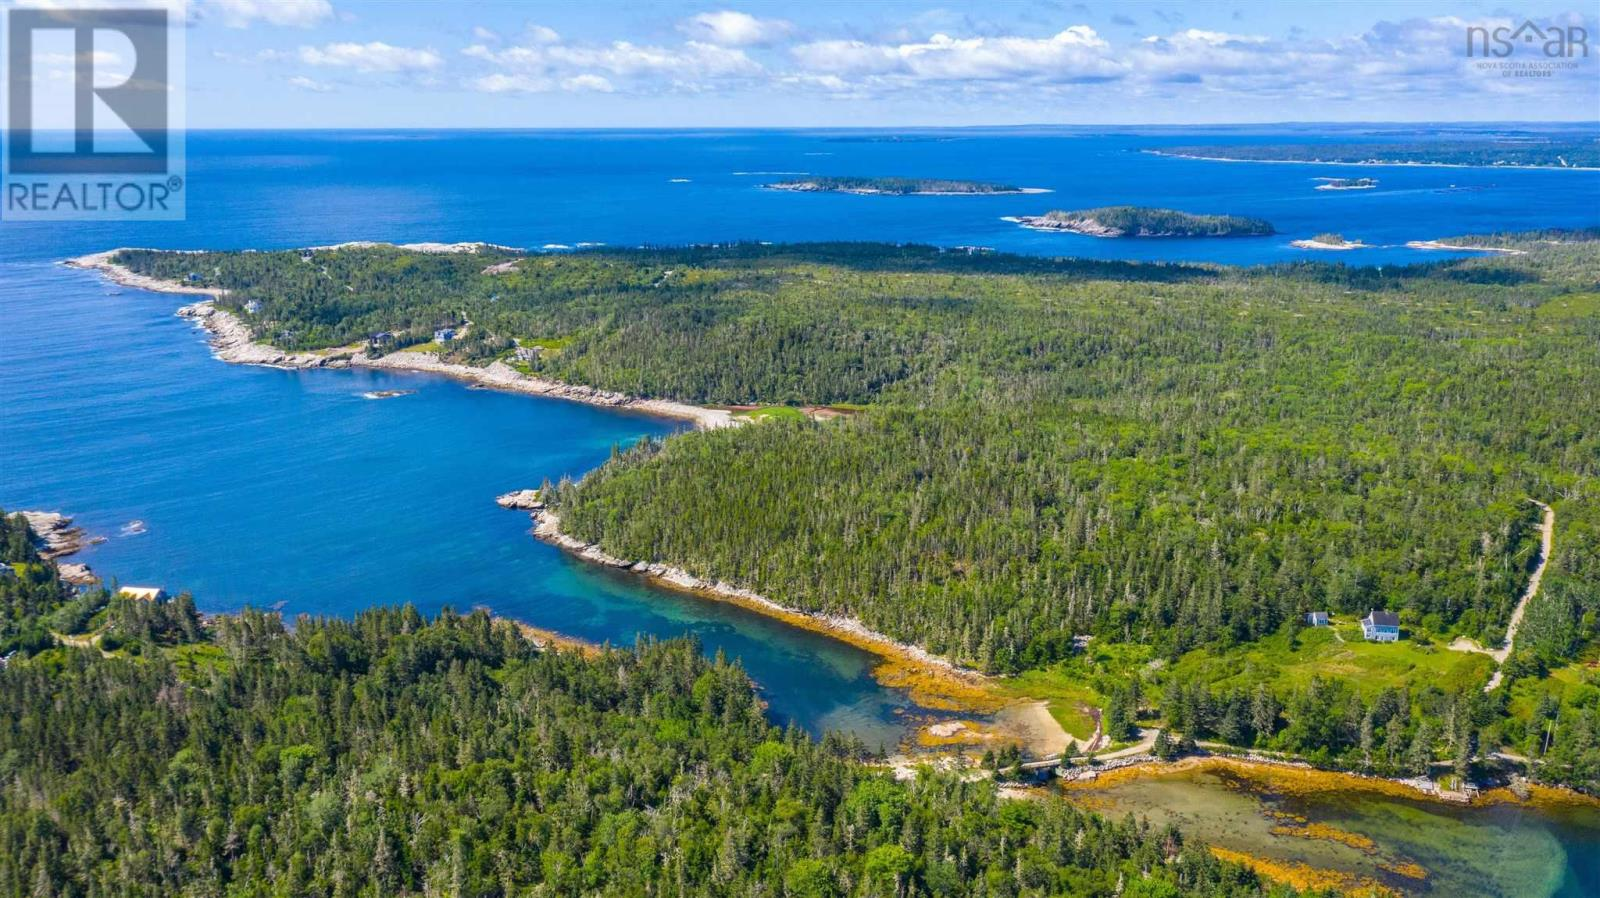 Lot W20-4 Owls Head Drive, Southwest Cove, Nova Scotia  B0J 1T0 - Photo 1 - 202125697